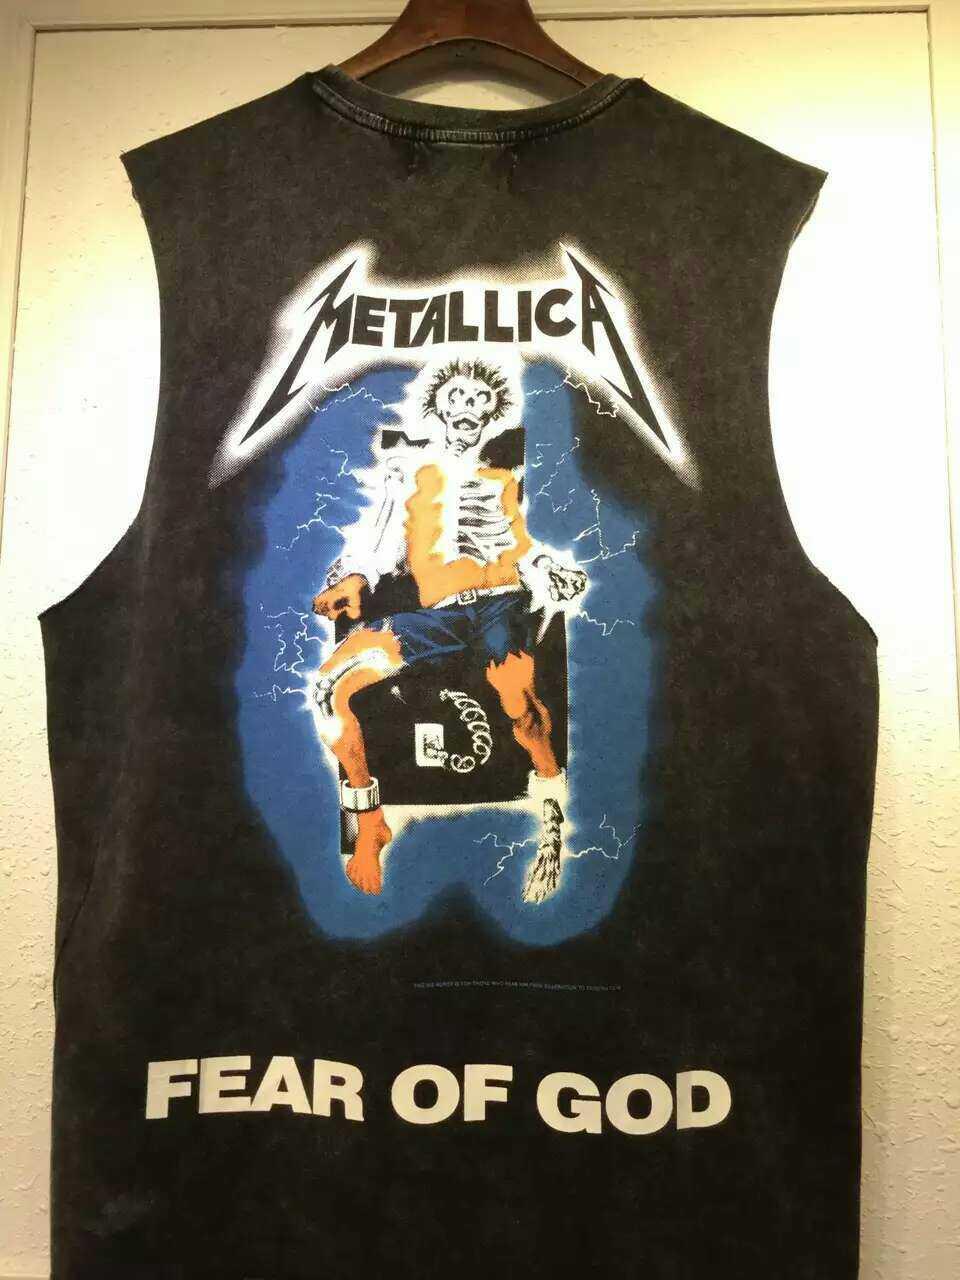 Best quality black t shirt - High Quality Justin Bieber Concert T Shirts Metallica Mens Tee Shirts Black Skull Thunder Men Printed